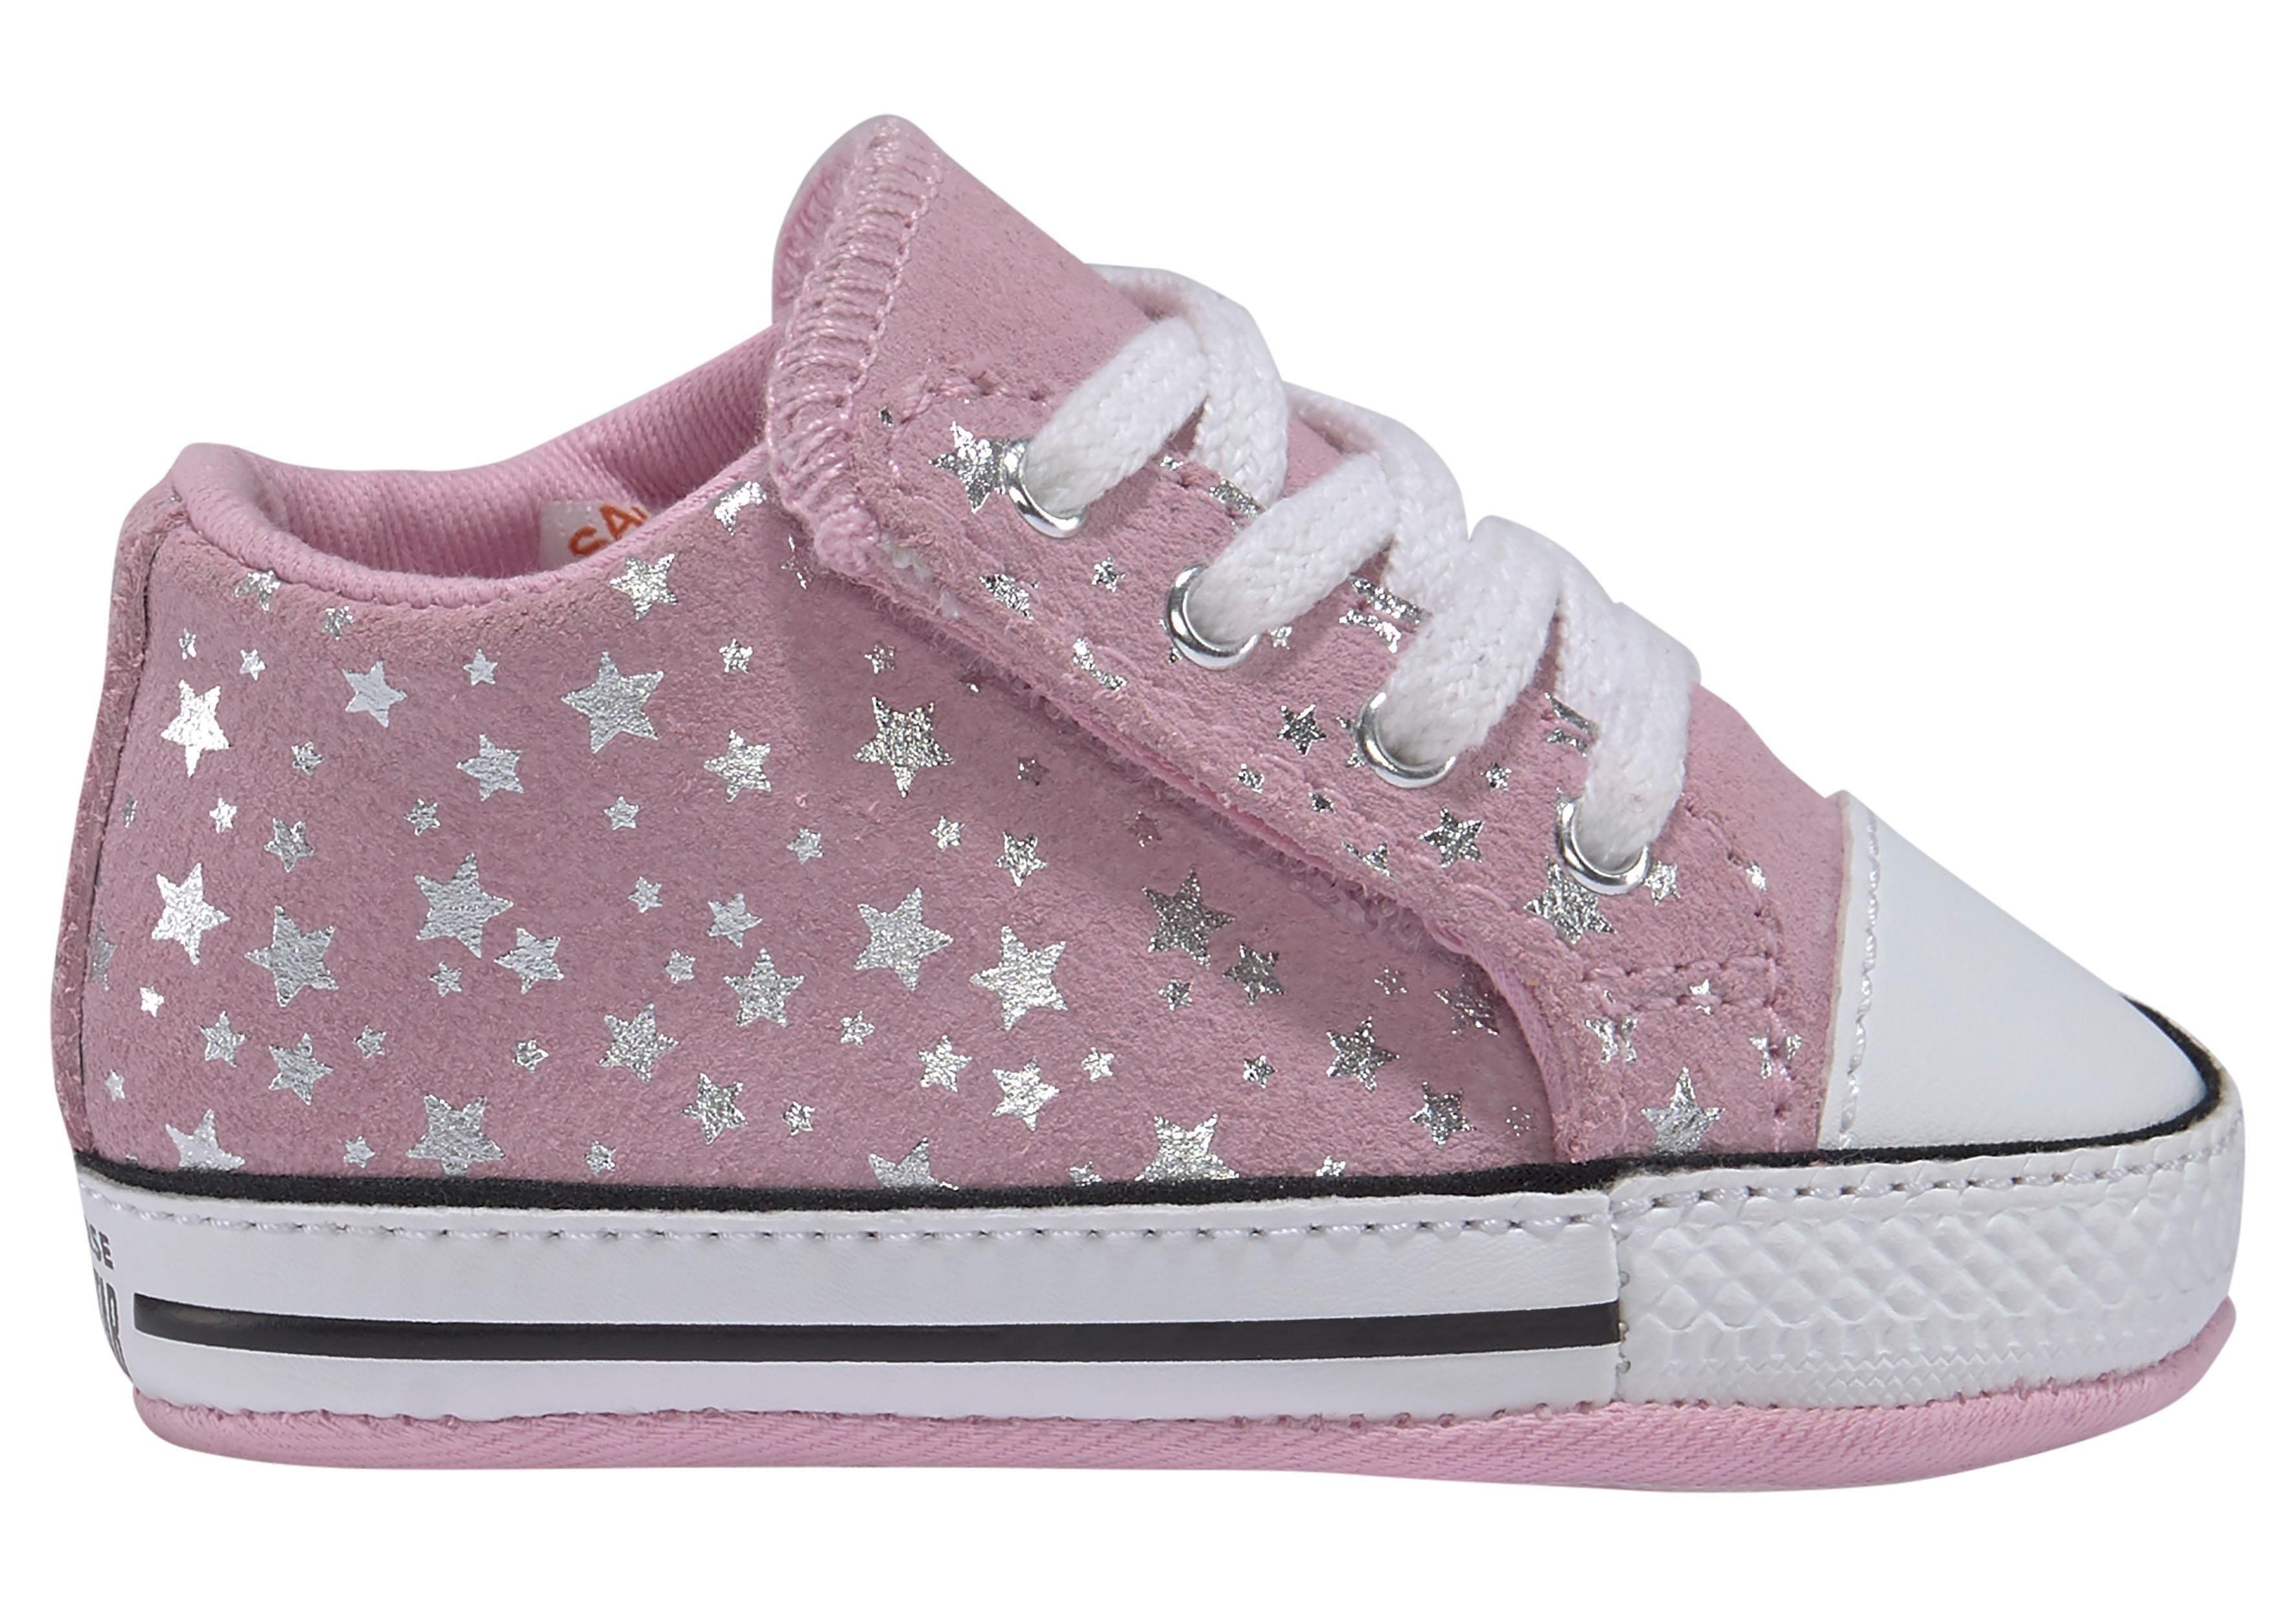 Converse babyschoentjes »Kinder CHUCK TAYLOR ALL STAR CRIBSTER-MID« bij OTTO online kopen